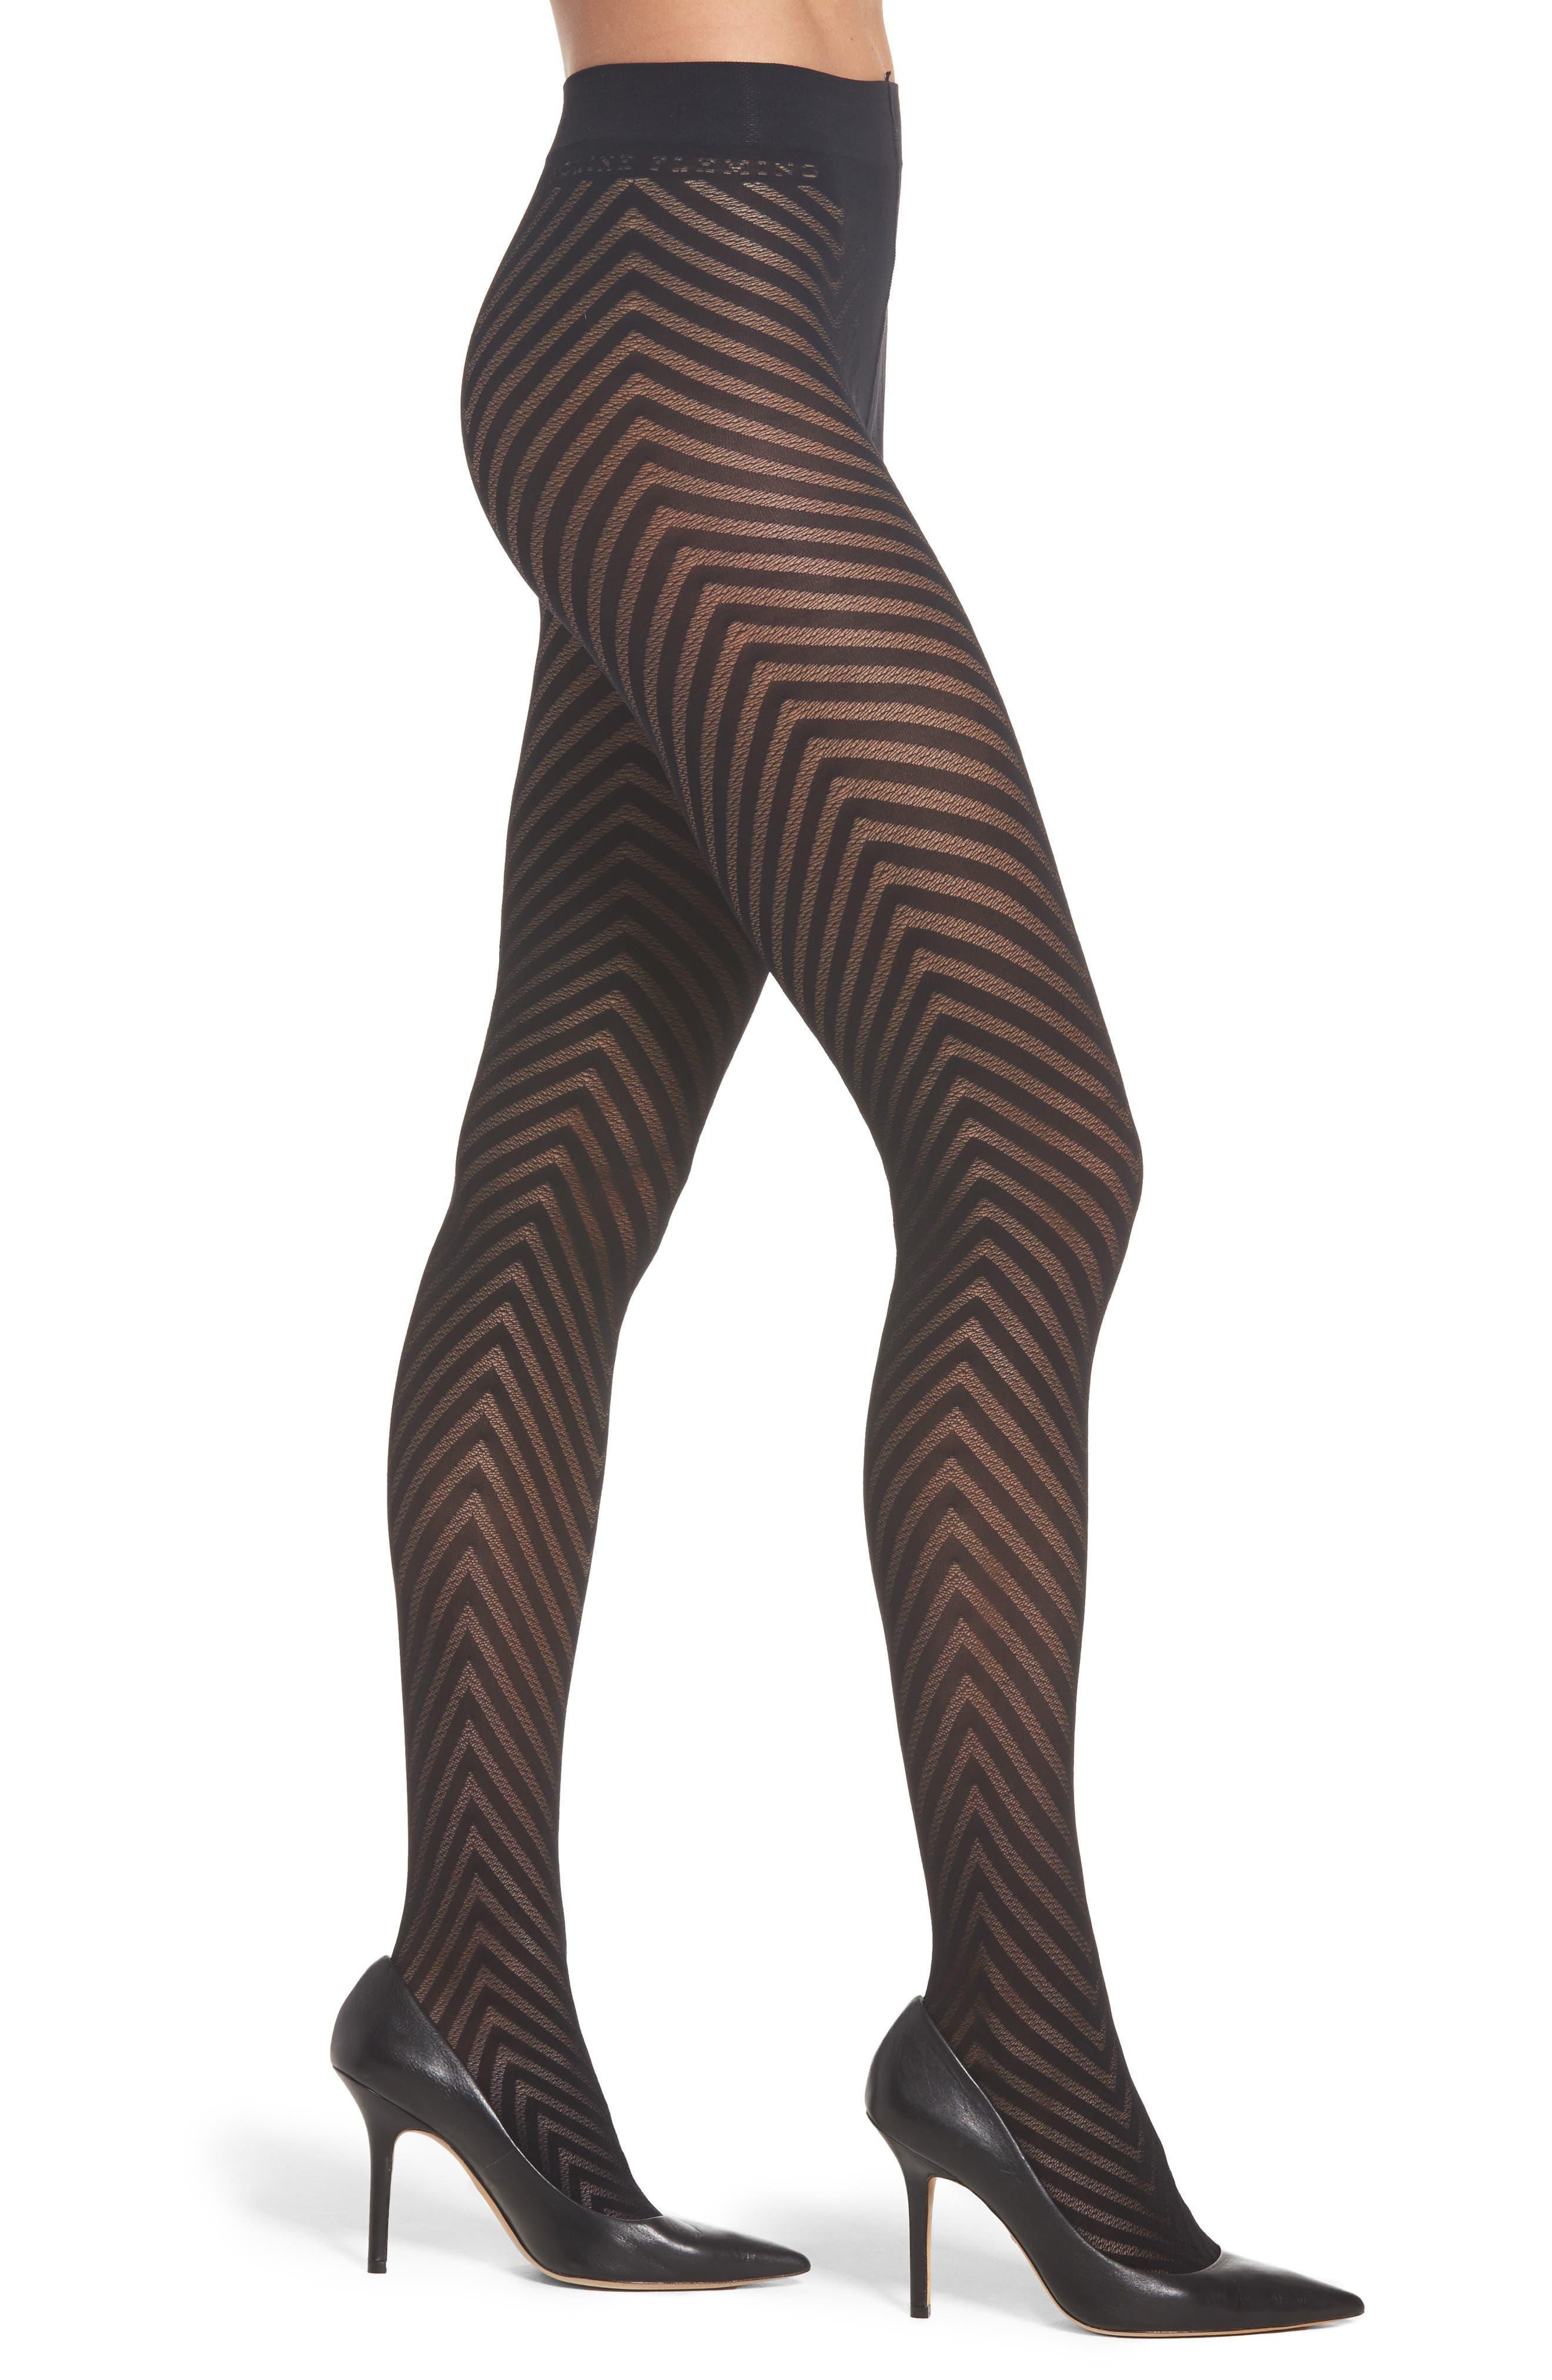 Alternate Image 1 Selected - Beautiful Legs by Caroline Fleming Chevron Pantyhose